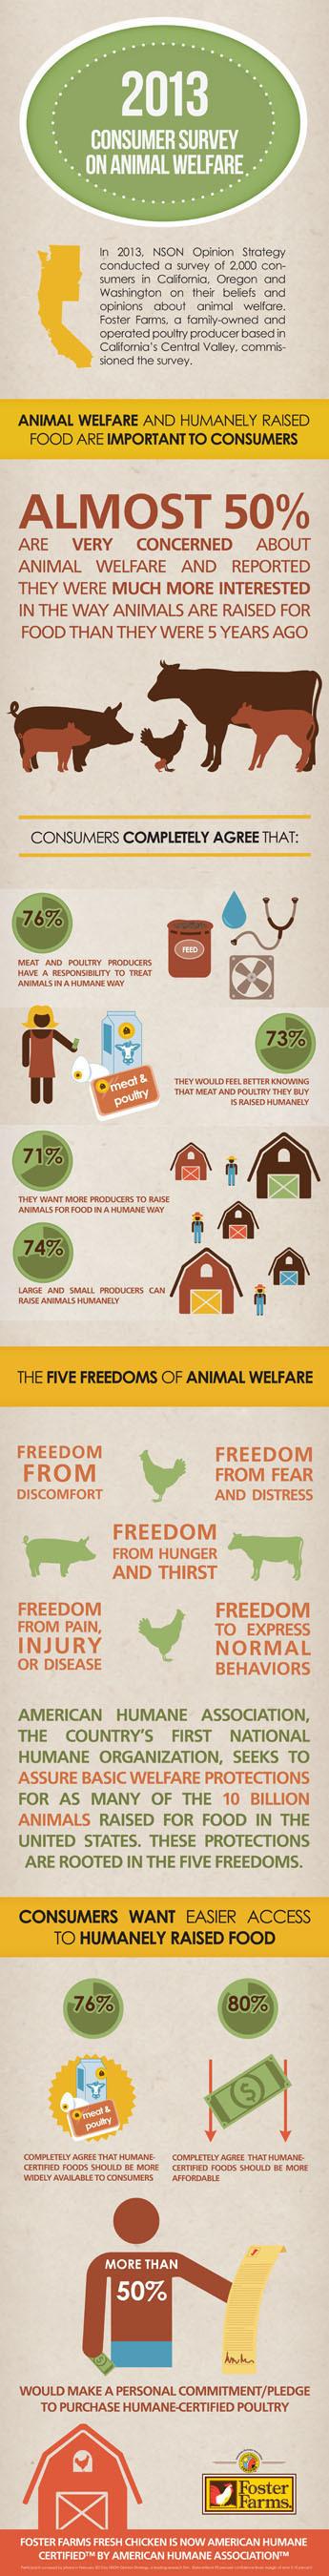 Infographic-Consumer Survey-Animal Welfare. (PRNewsFoto/Foster Farms) (PRNewsFoto/FOSTER FARMS)